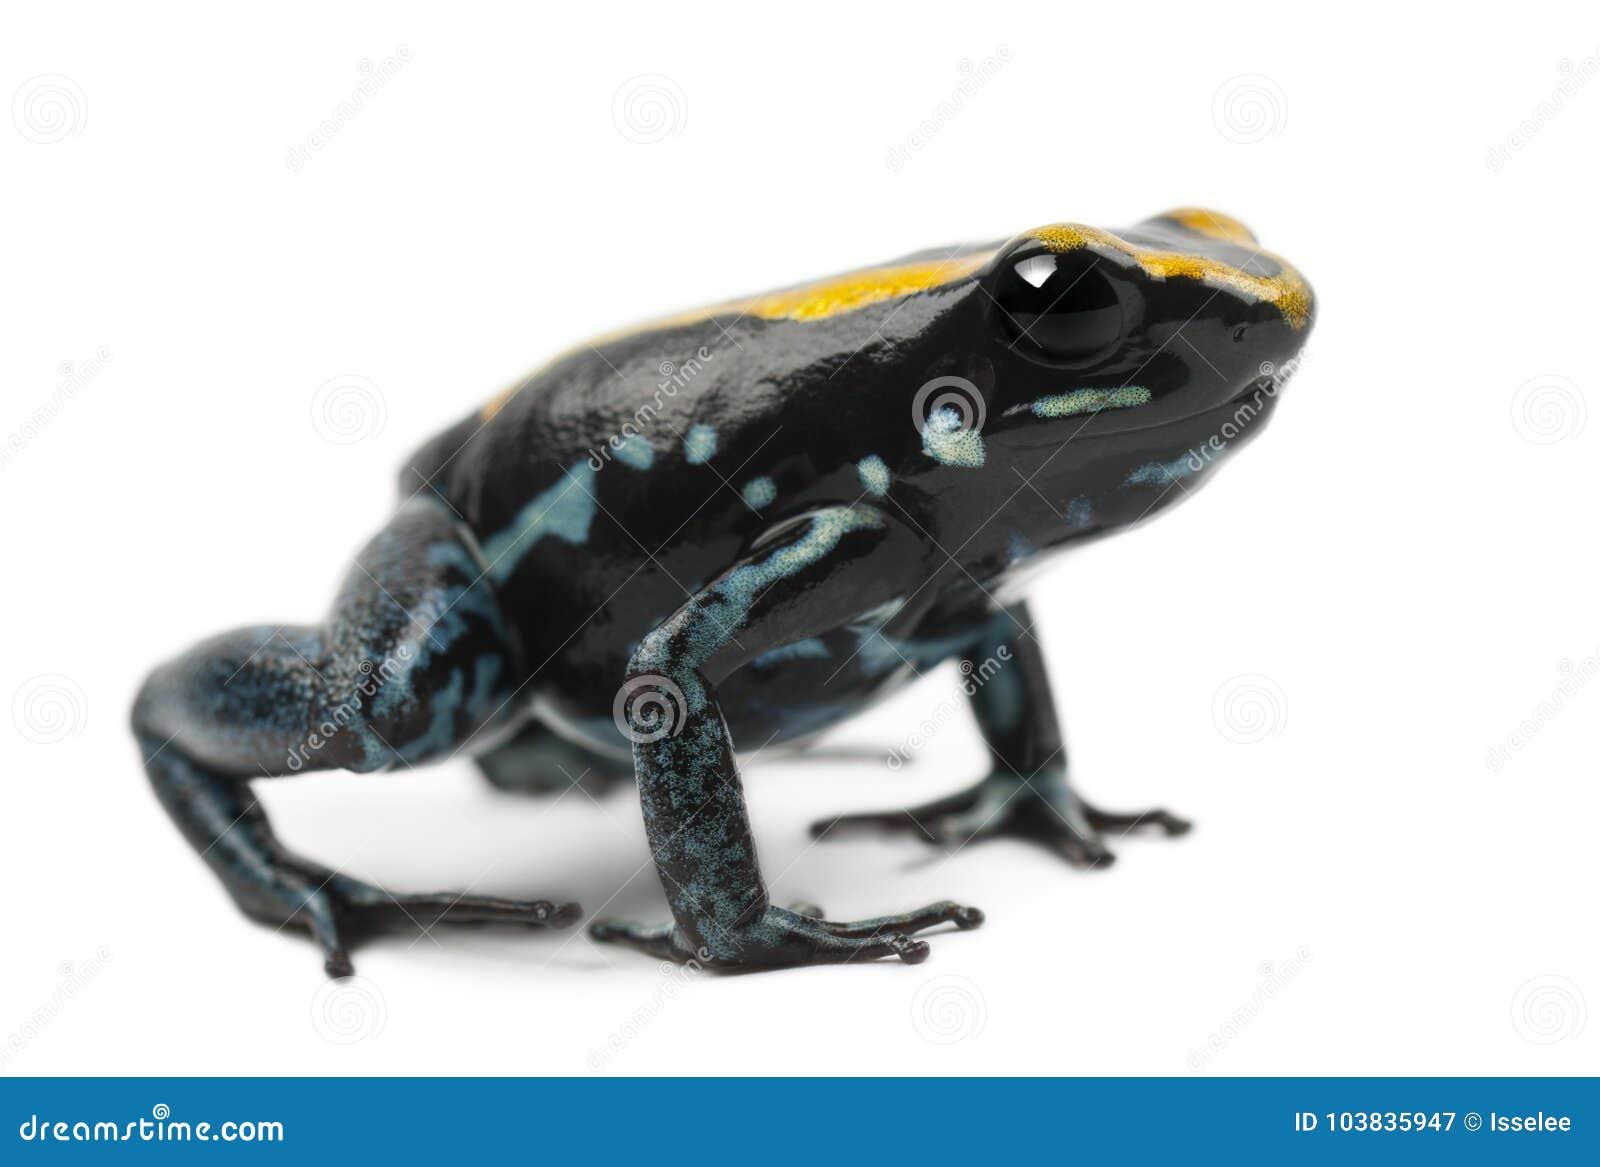 Golfodulcean Poison Frog, Phyllobates vittatus, against white ba